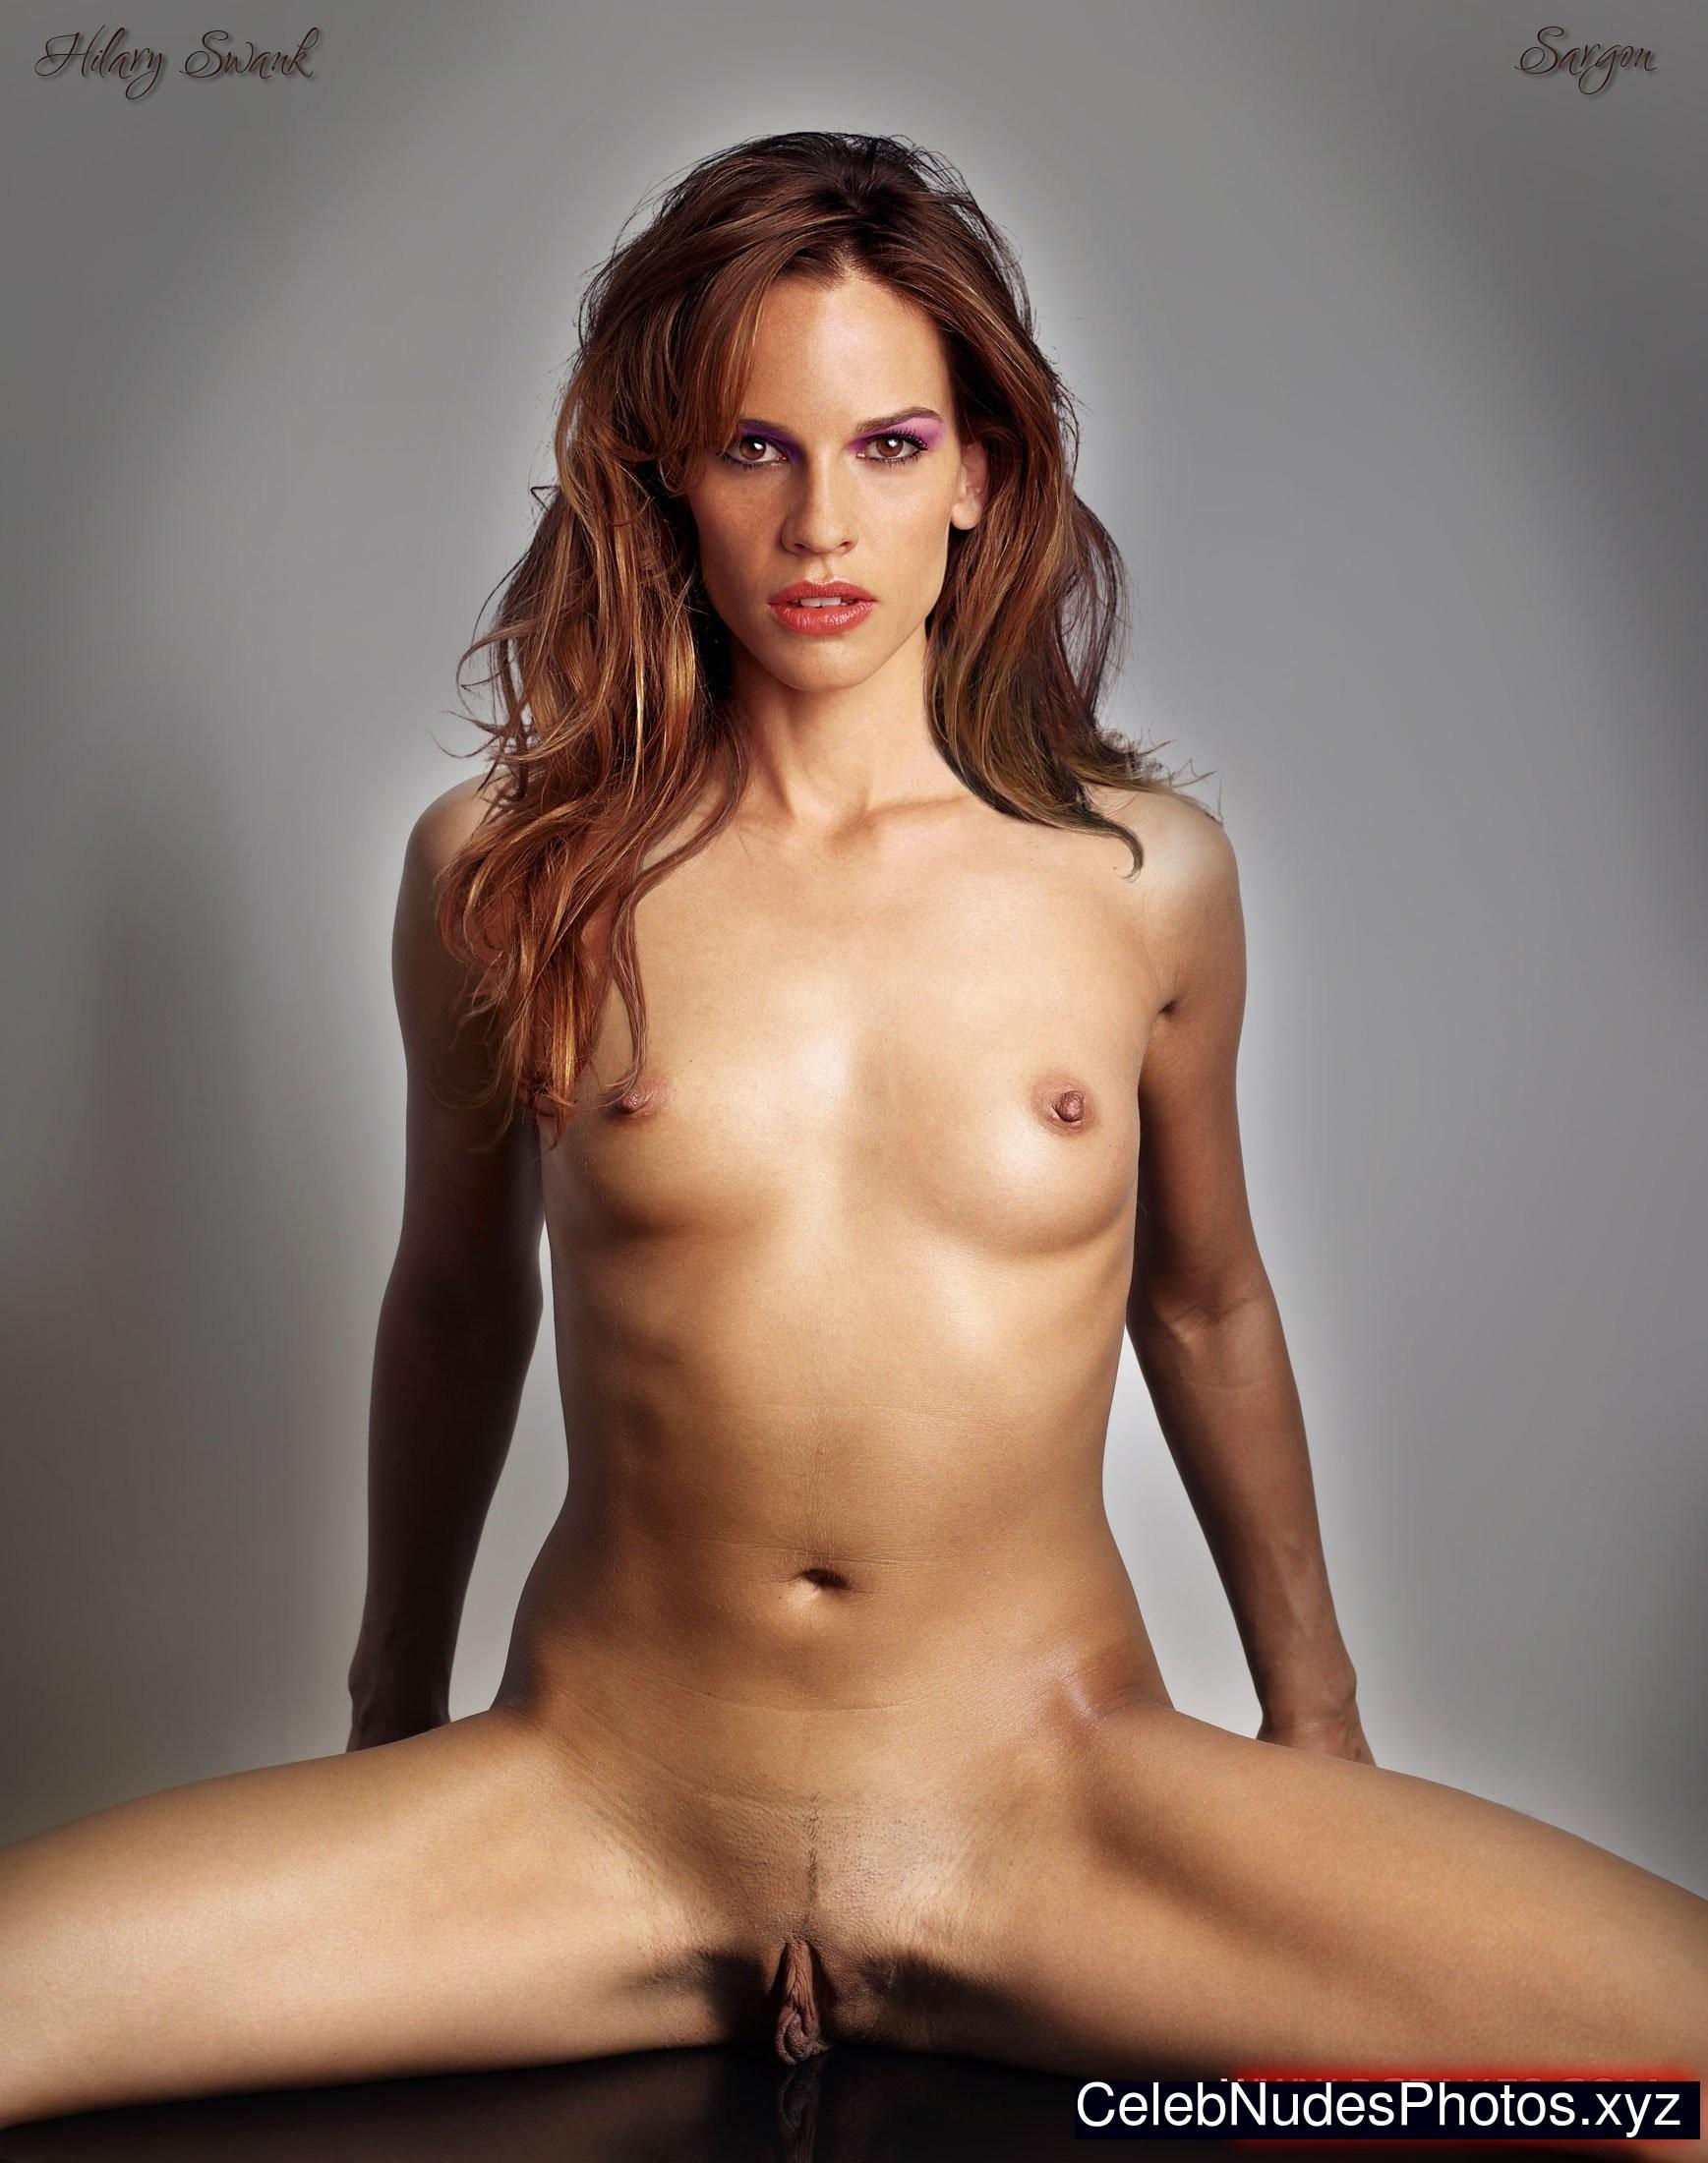 hilary swank topless